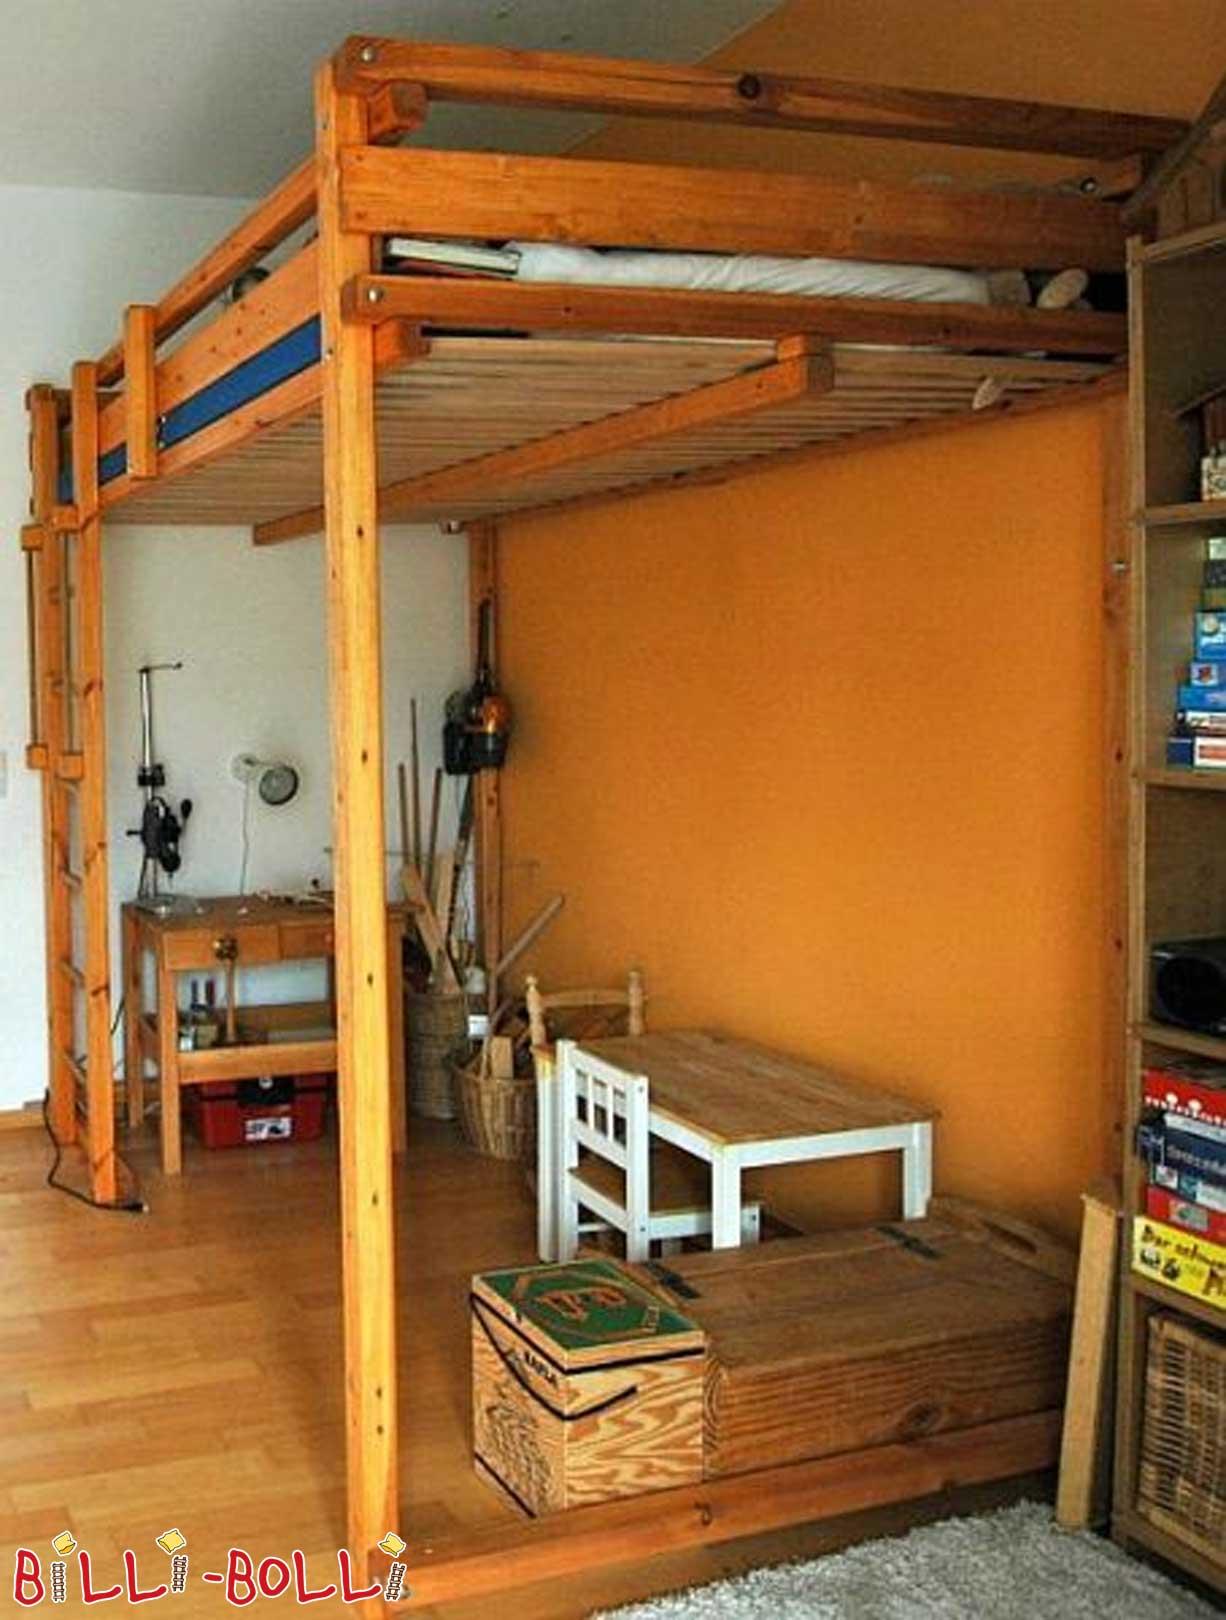 hochbett f r studenten online kaufen billi bolli. Black Bedroom Furniture Sets. Home Design Ideas